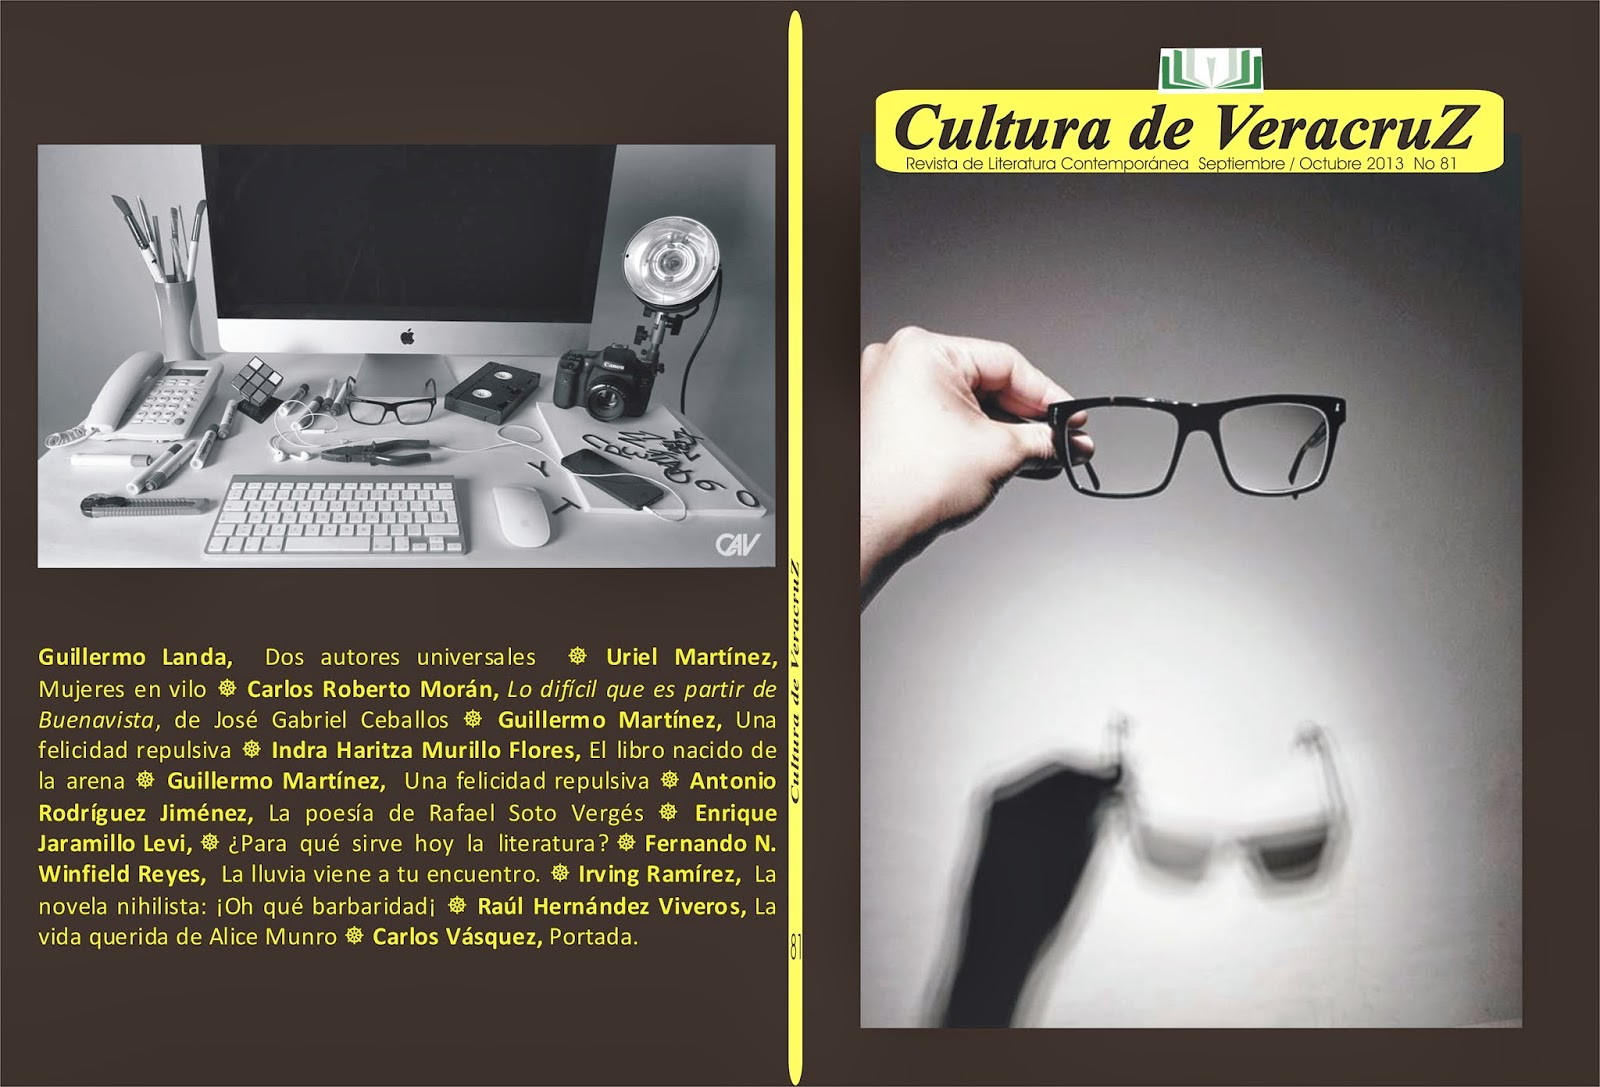 REVISTA Cultura de VeracruZ 81, Da click en la portada para descargar